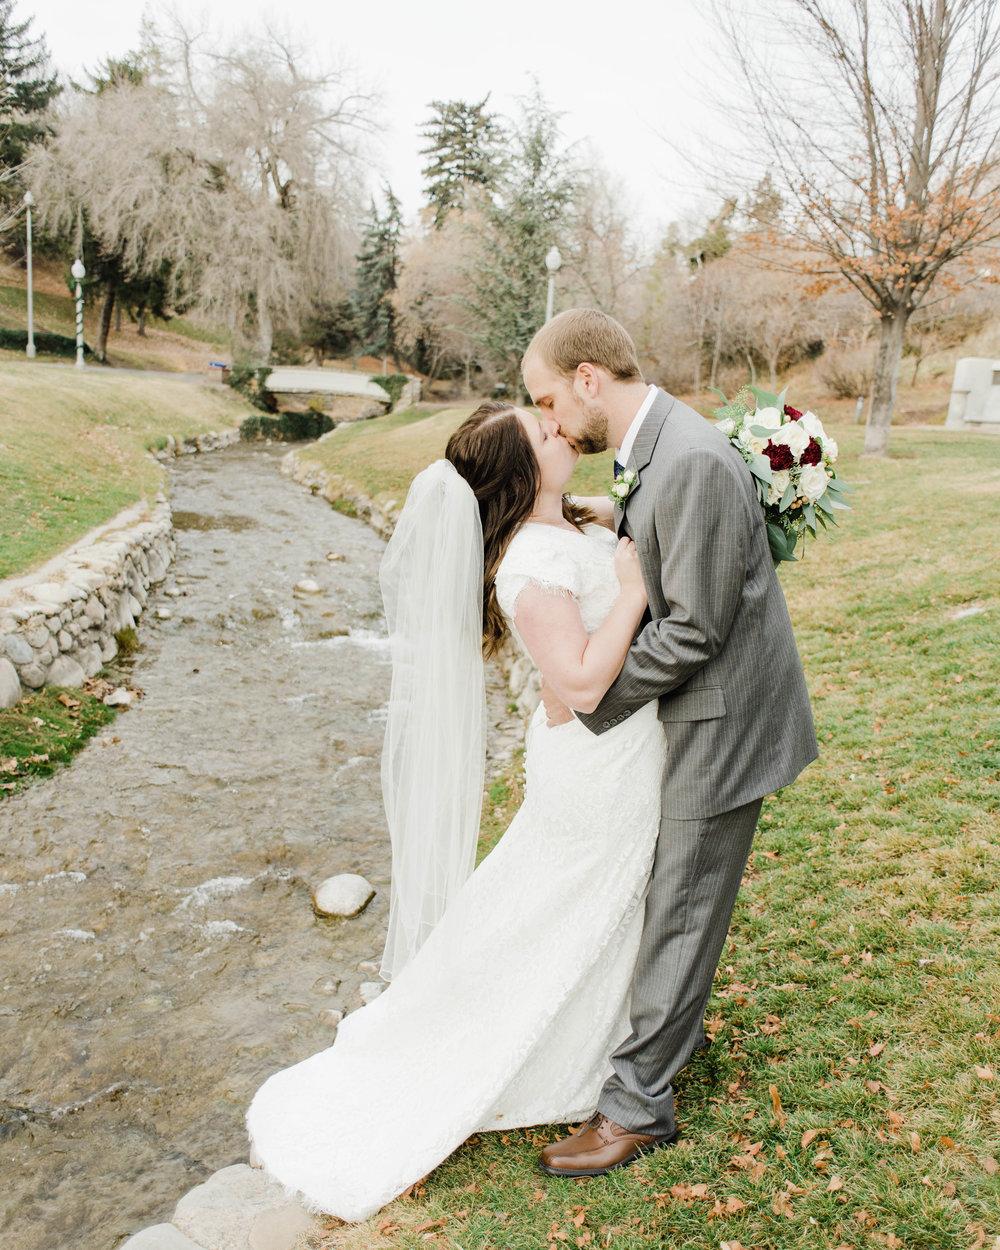 LINDSAY+BRAD-BRIDALS-Sadie_Banks_Photography-56.jpg